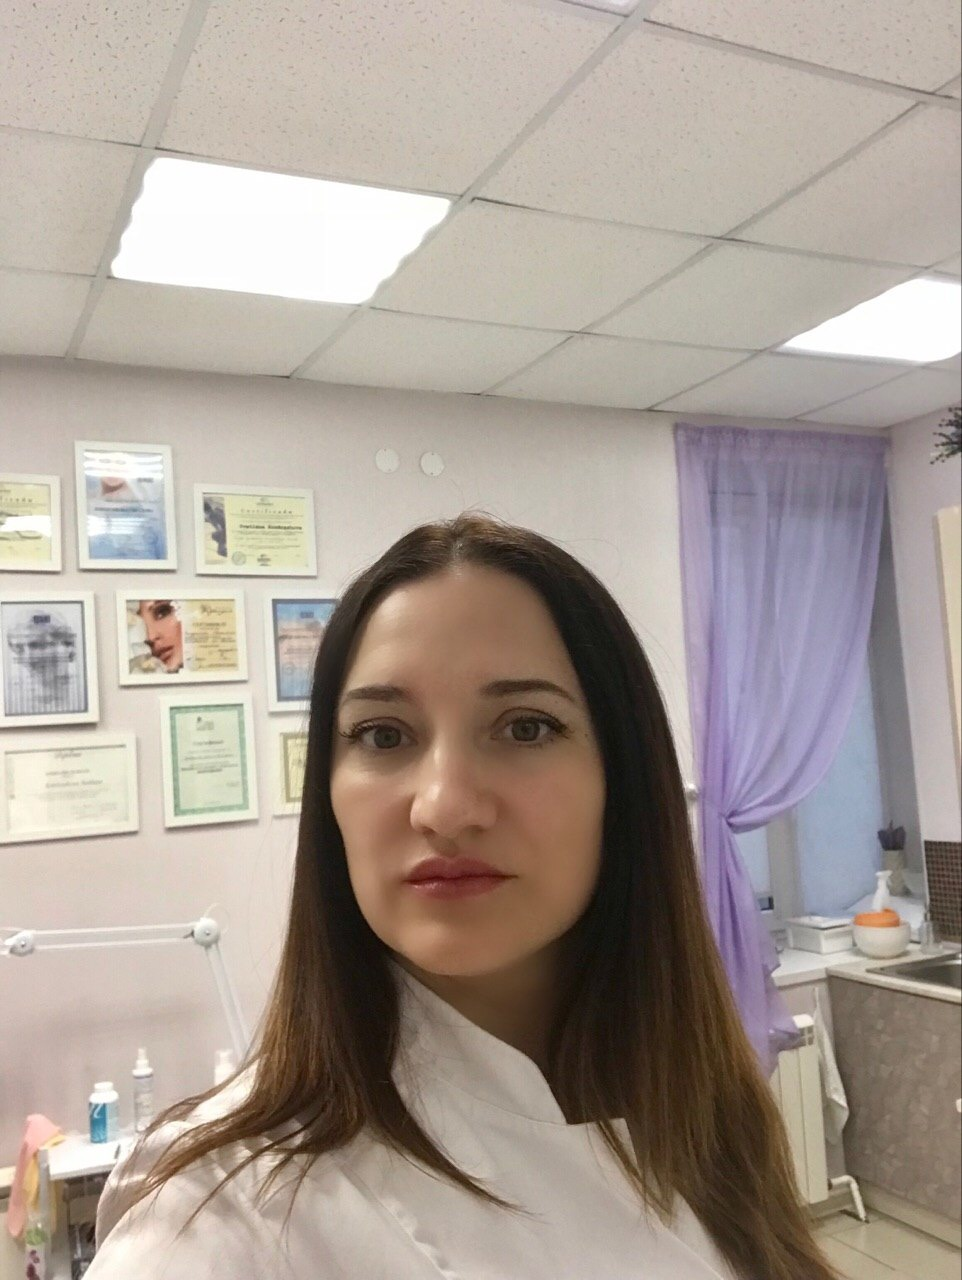 Наталья, студия красоты, Петрозаводск